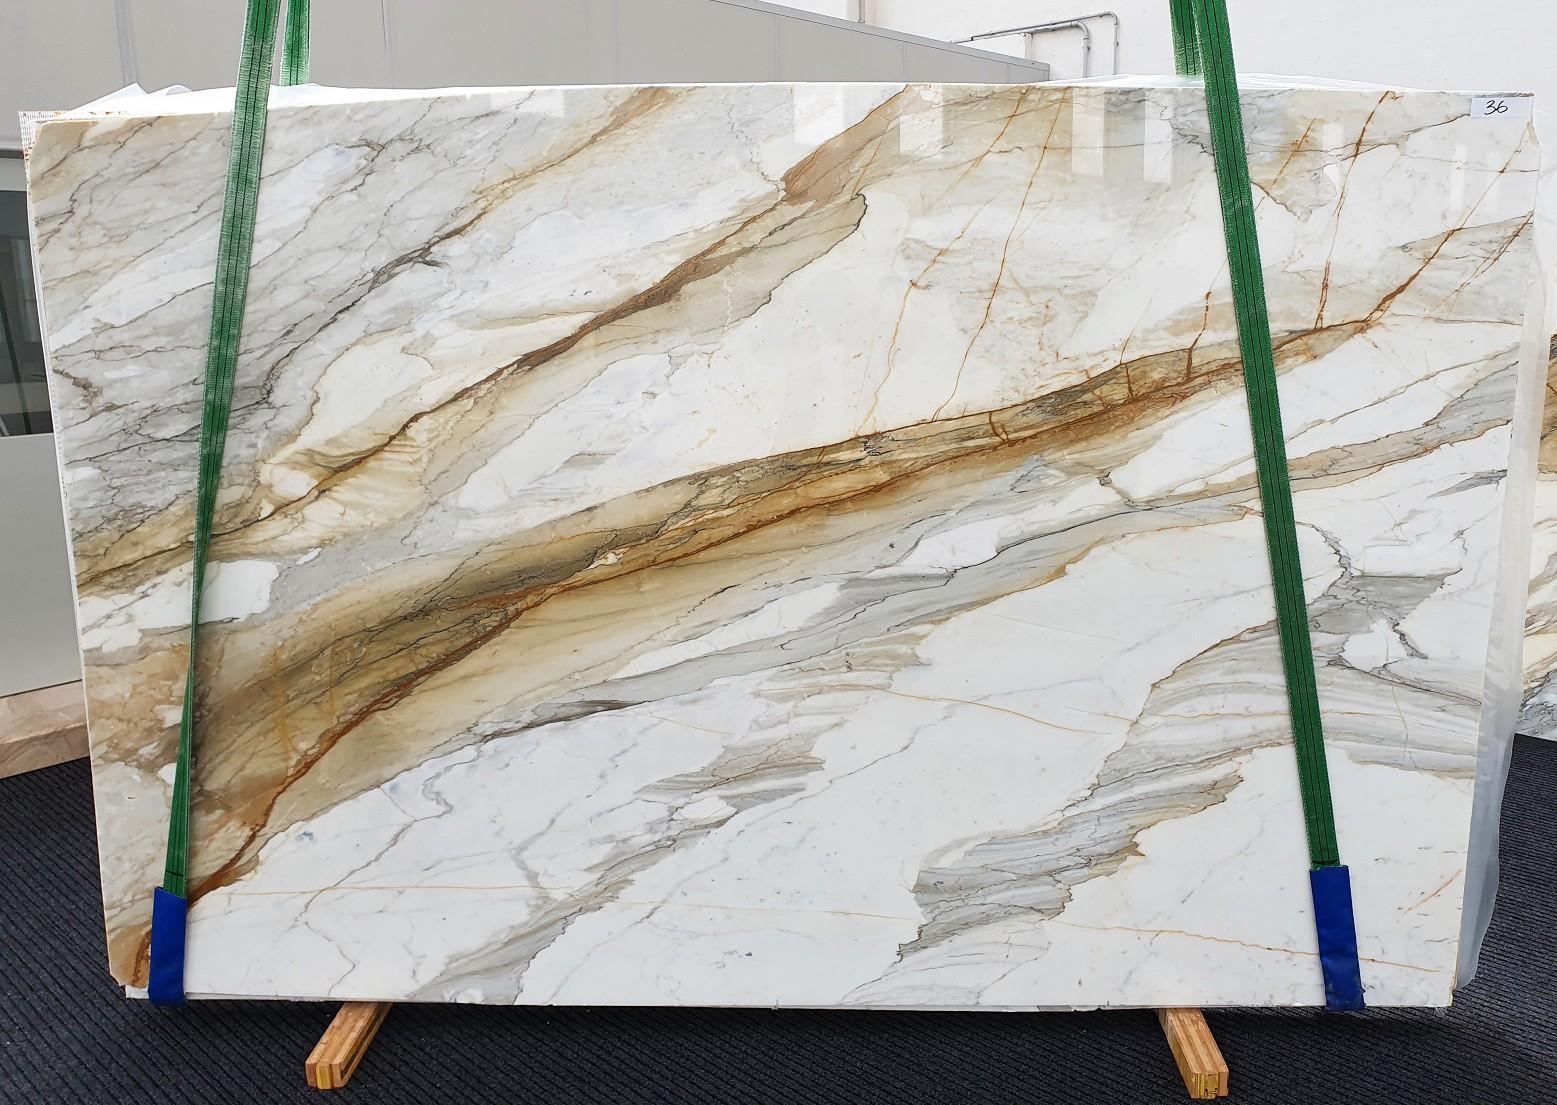 CALACATTA MACCHIAVECCHIA polierte Unmaßplatten 1354 aus Natur Marmor , Slab #36: Lieferung Veneto, Italien